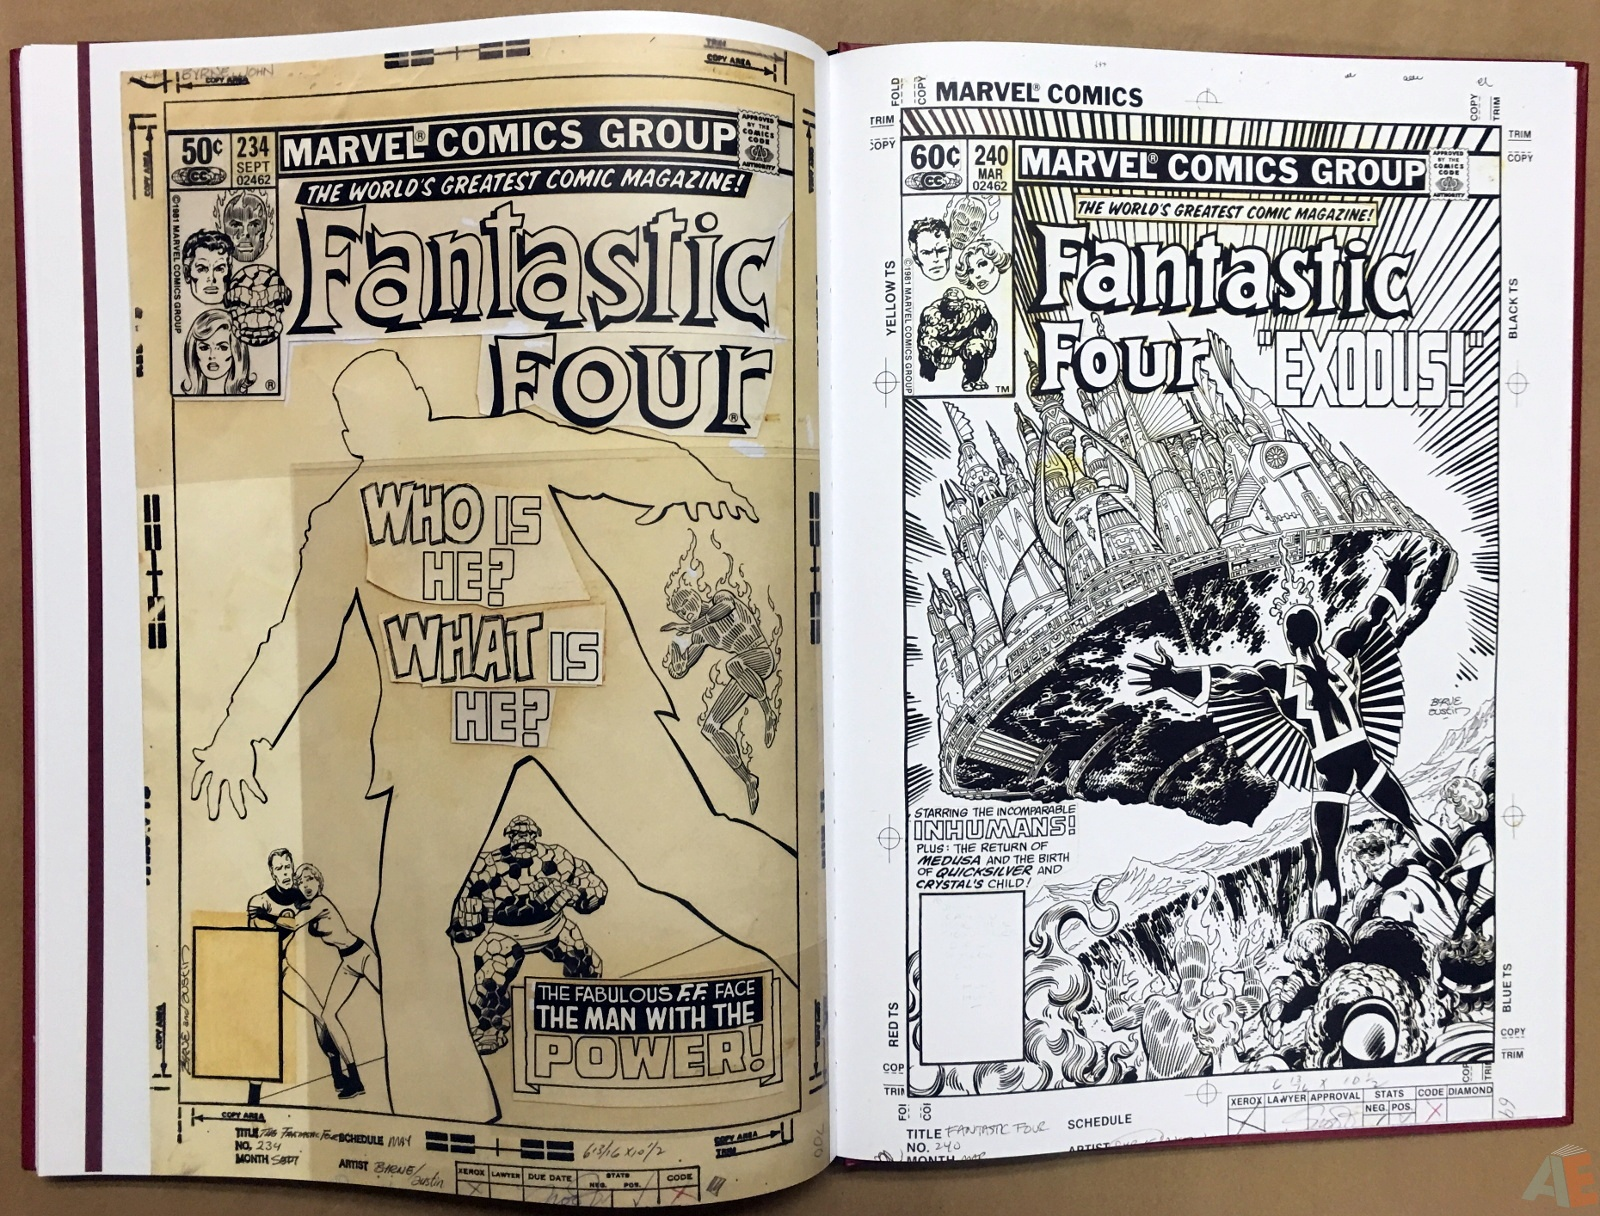 John Byrne's The Fantastic Four Artist's Edition 54